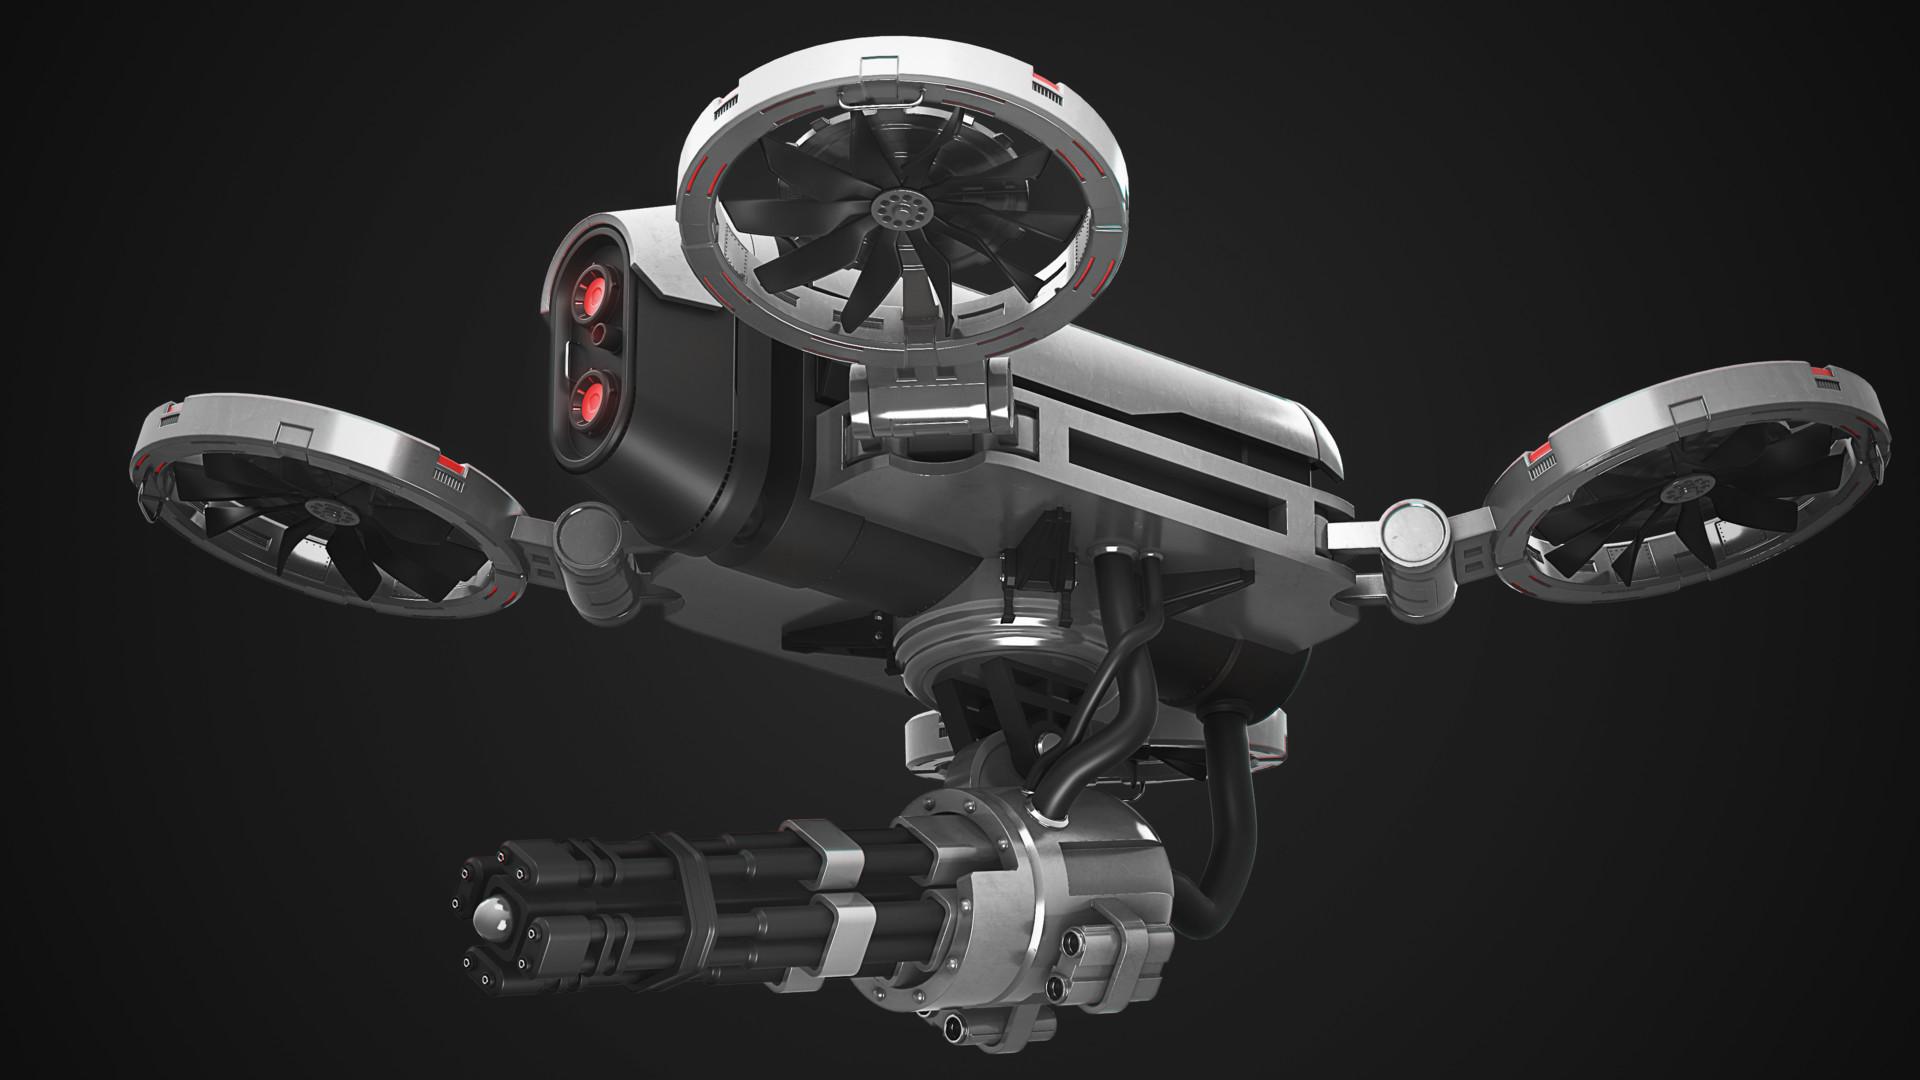 gregori-vorontsov-drone-03.jpg?151570404